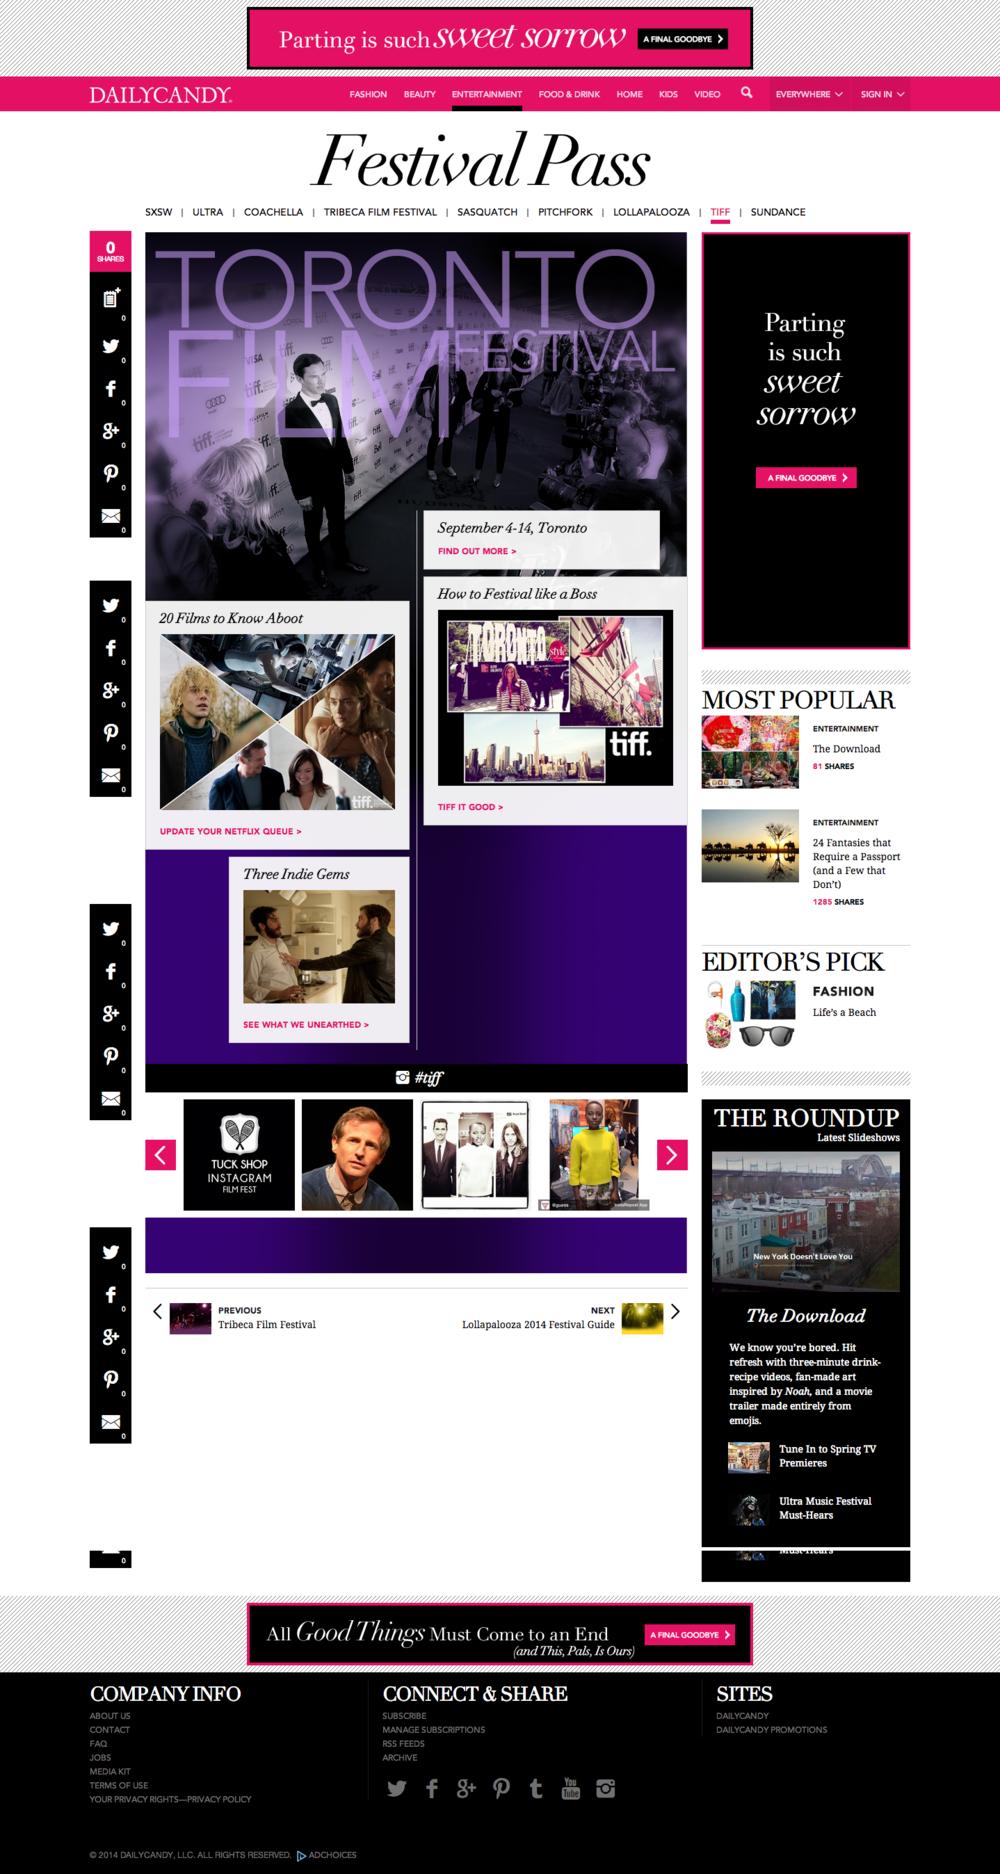 tiff2013festivalpass.jpg